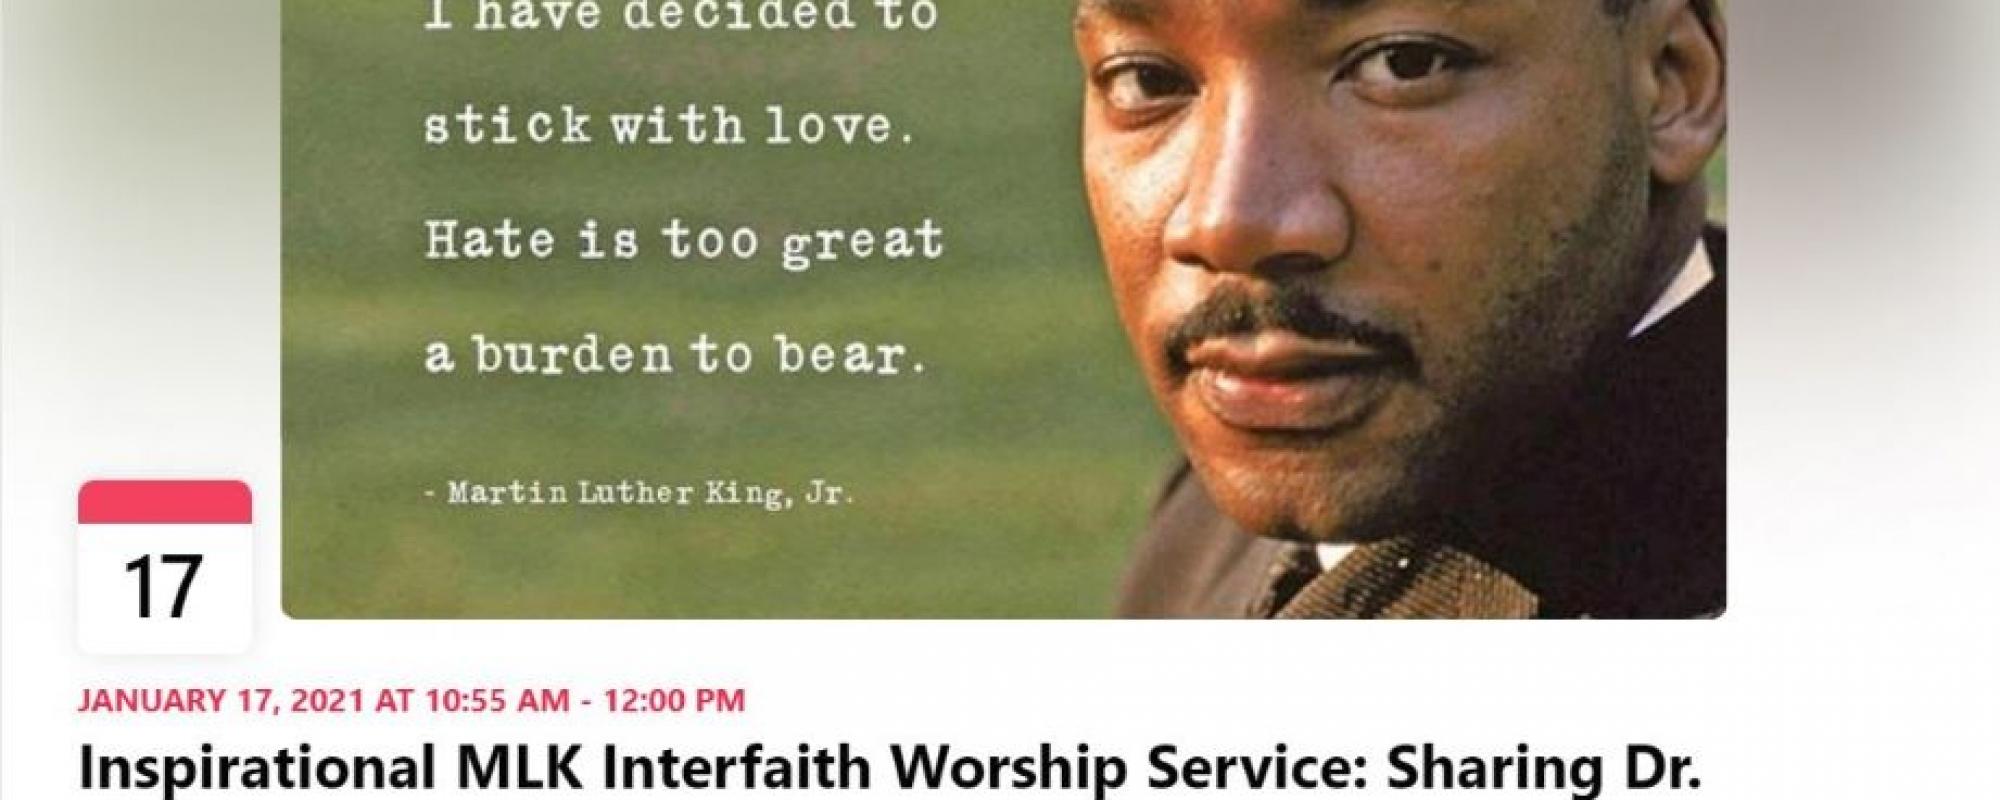 MLK 2021 worship service